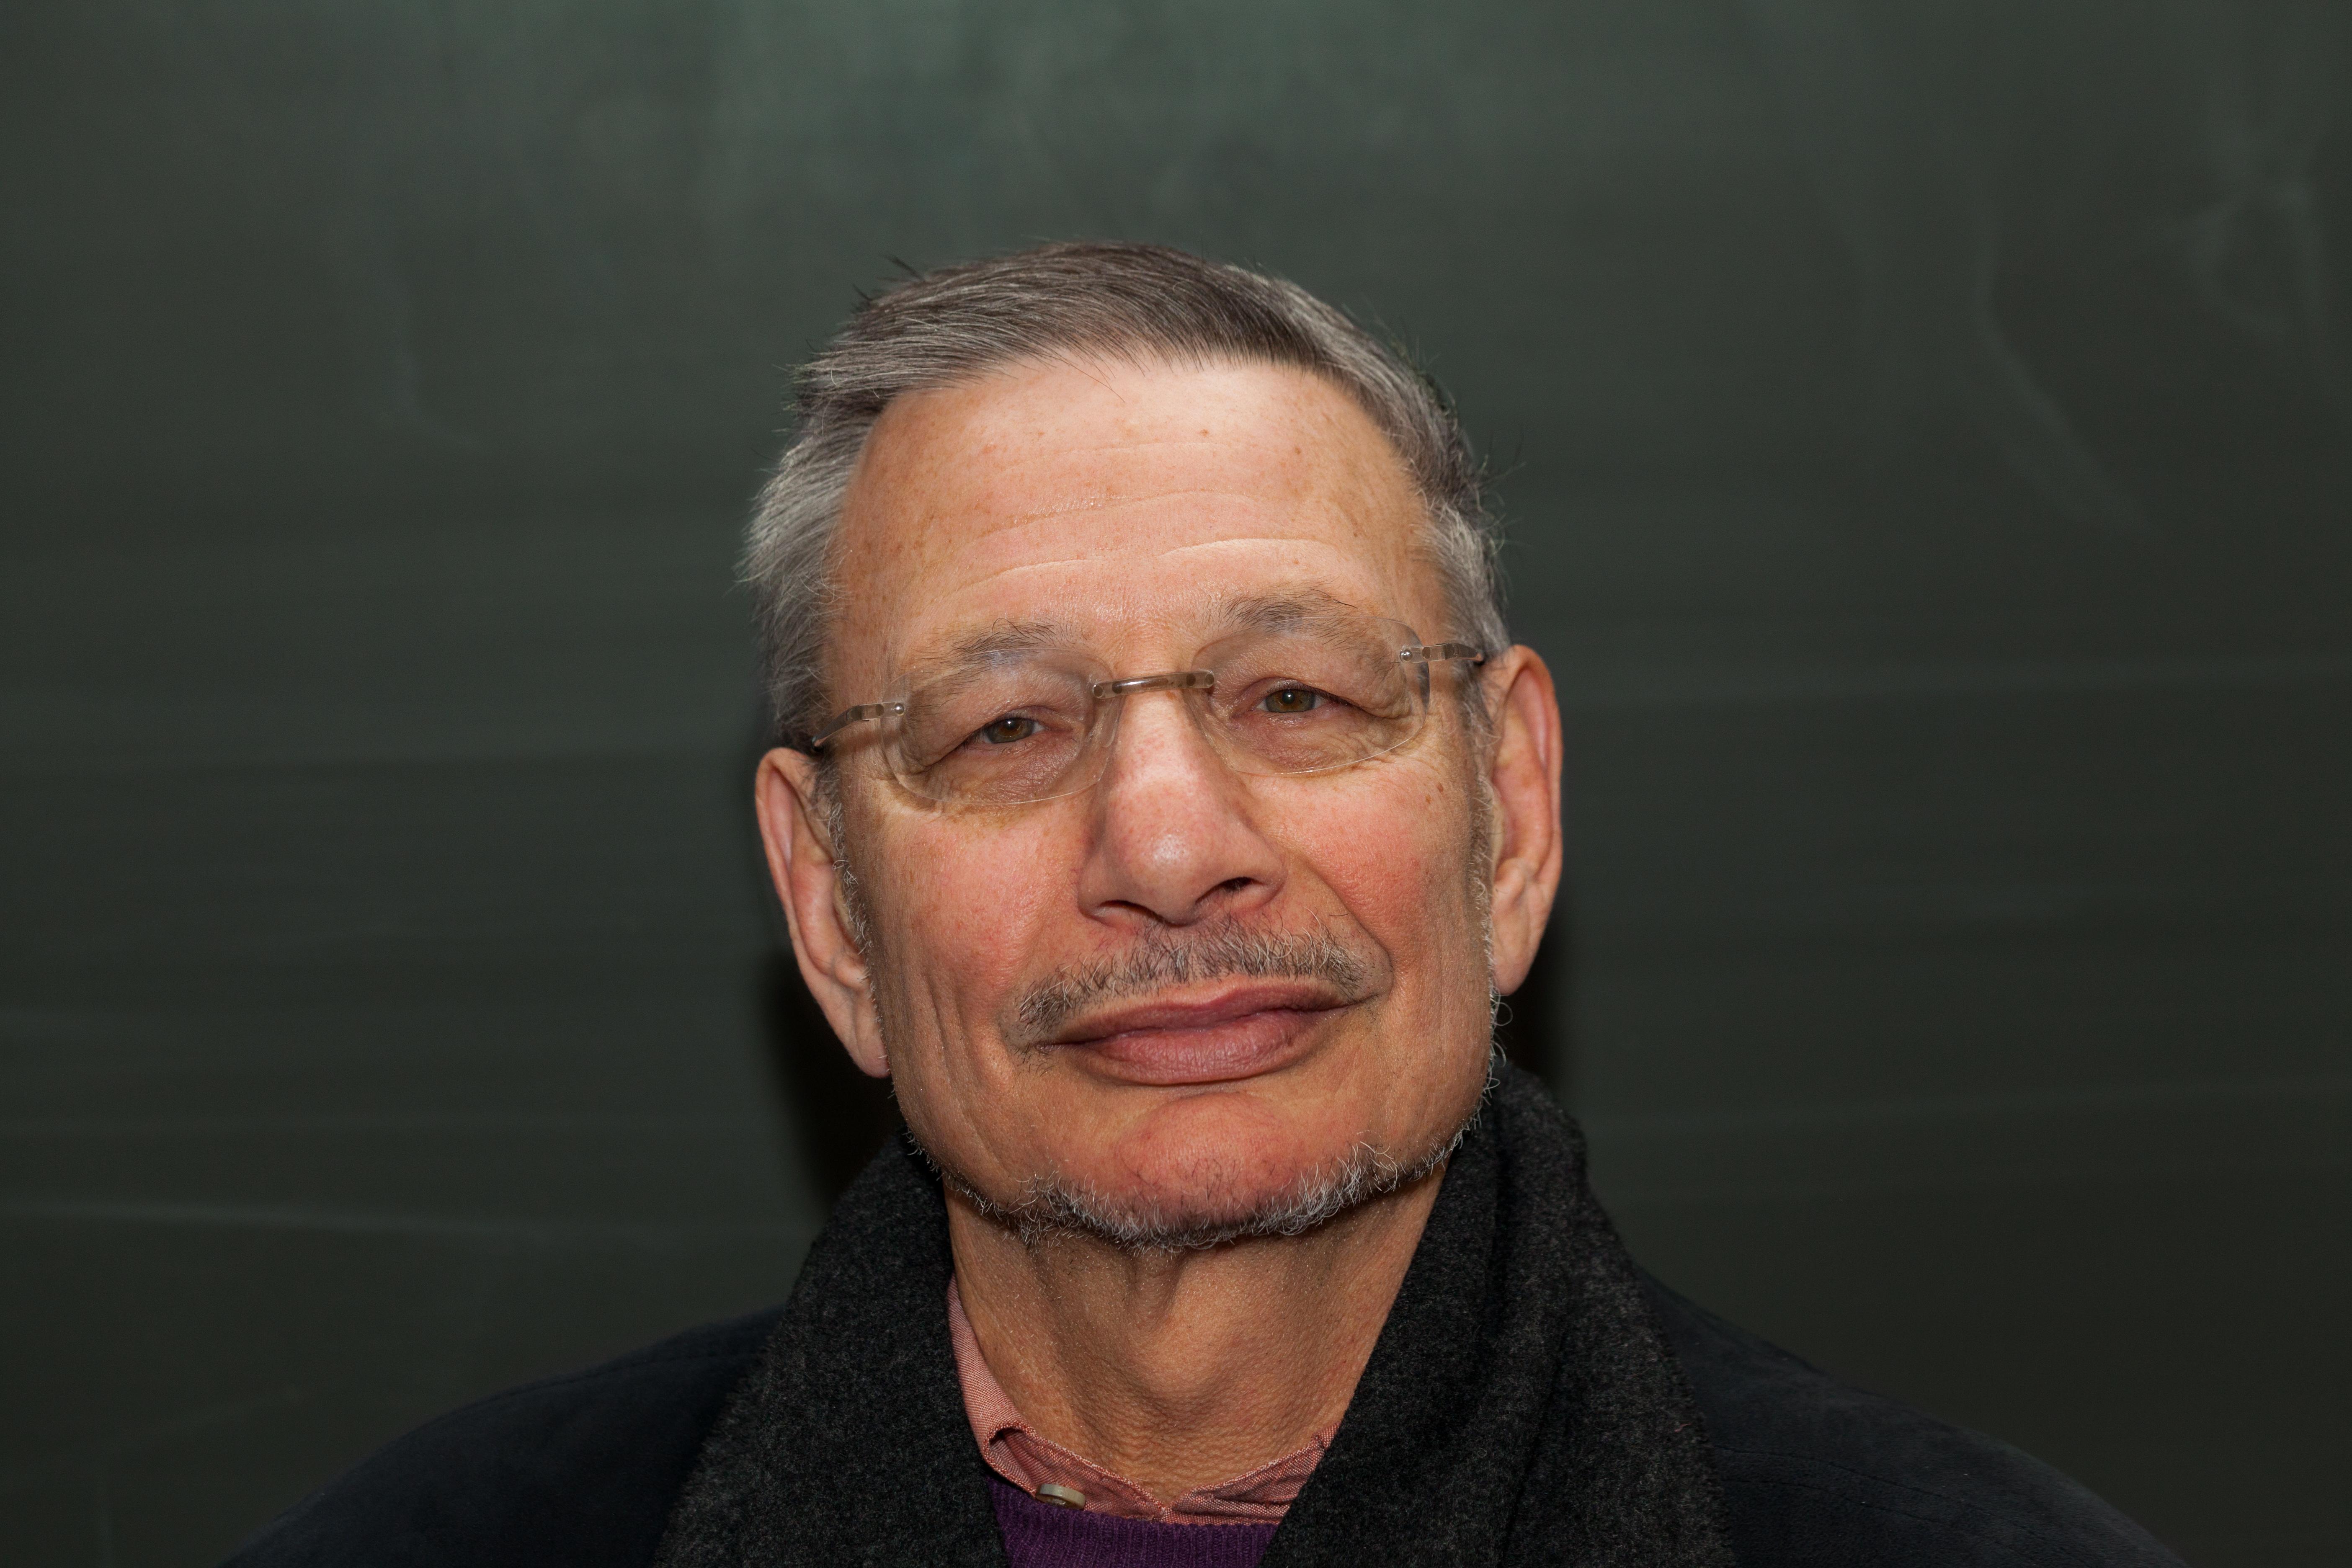 Richard Ned Lebow in January 2012 at the [[University of Hamburg]].